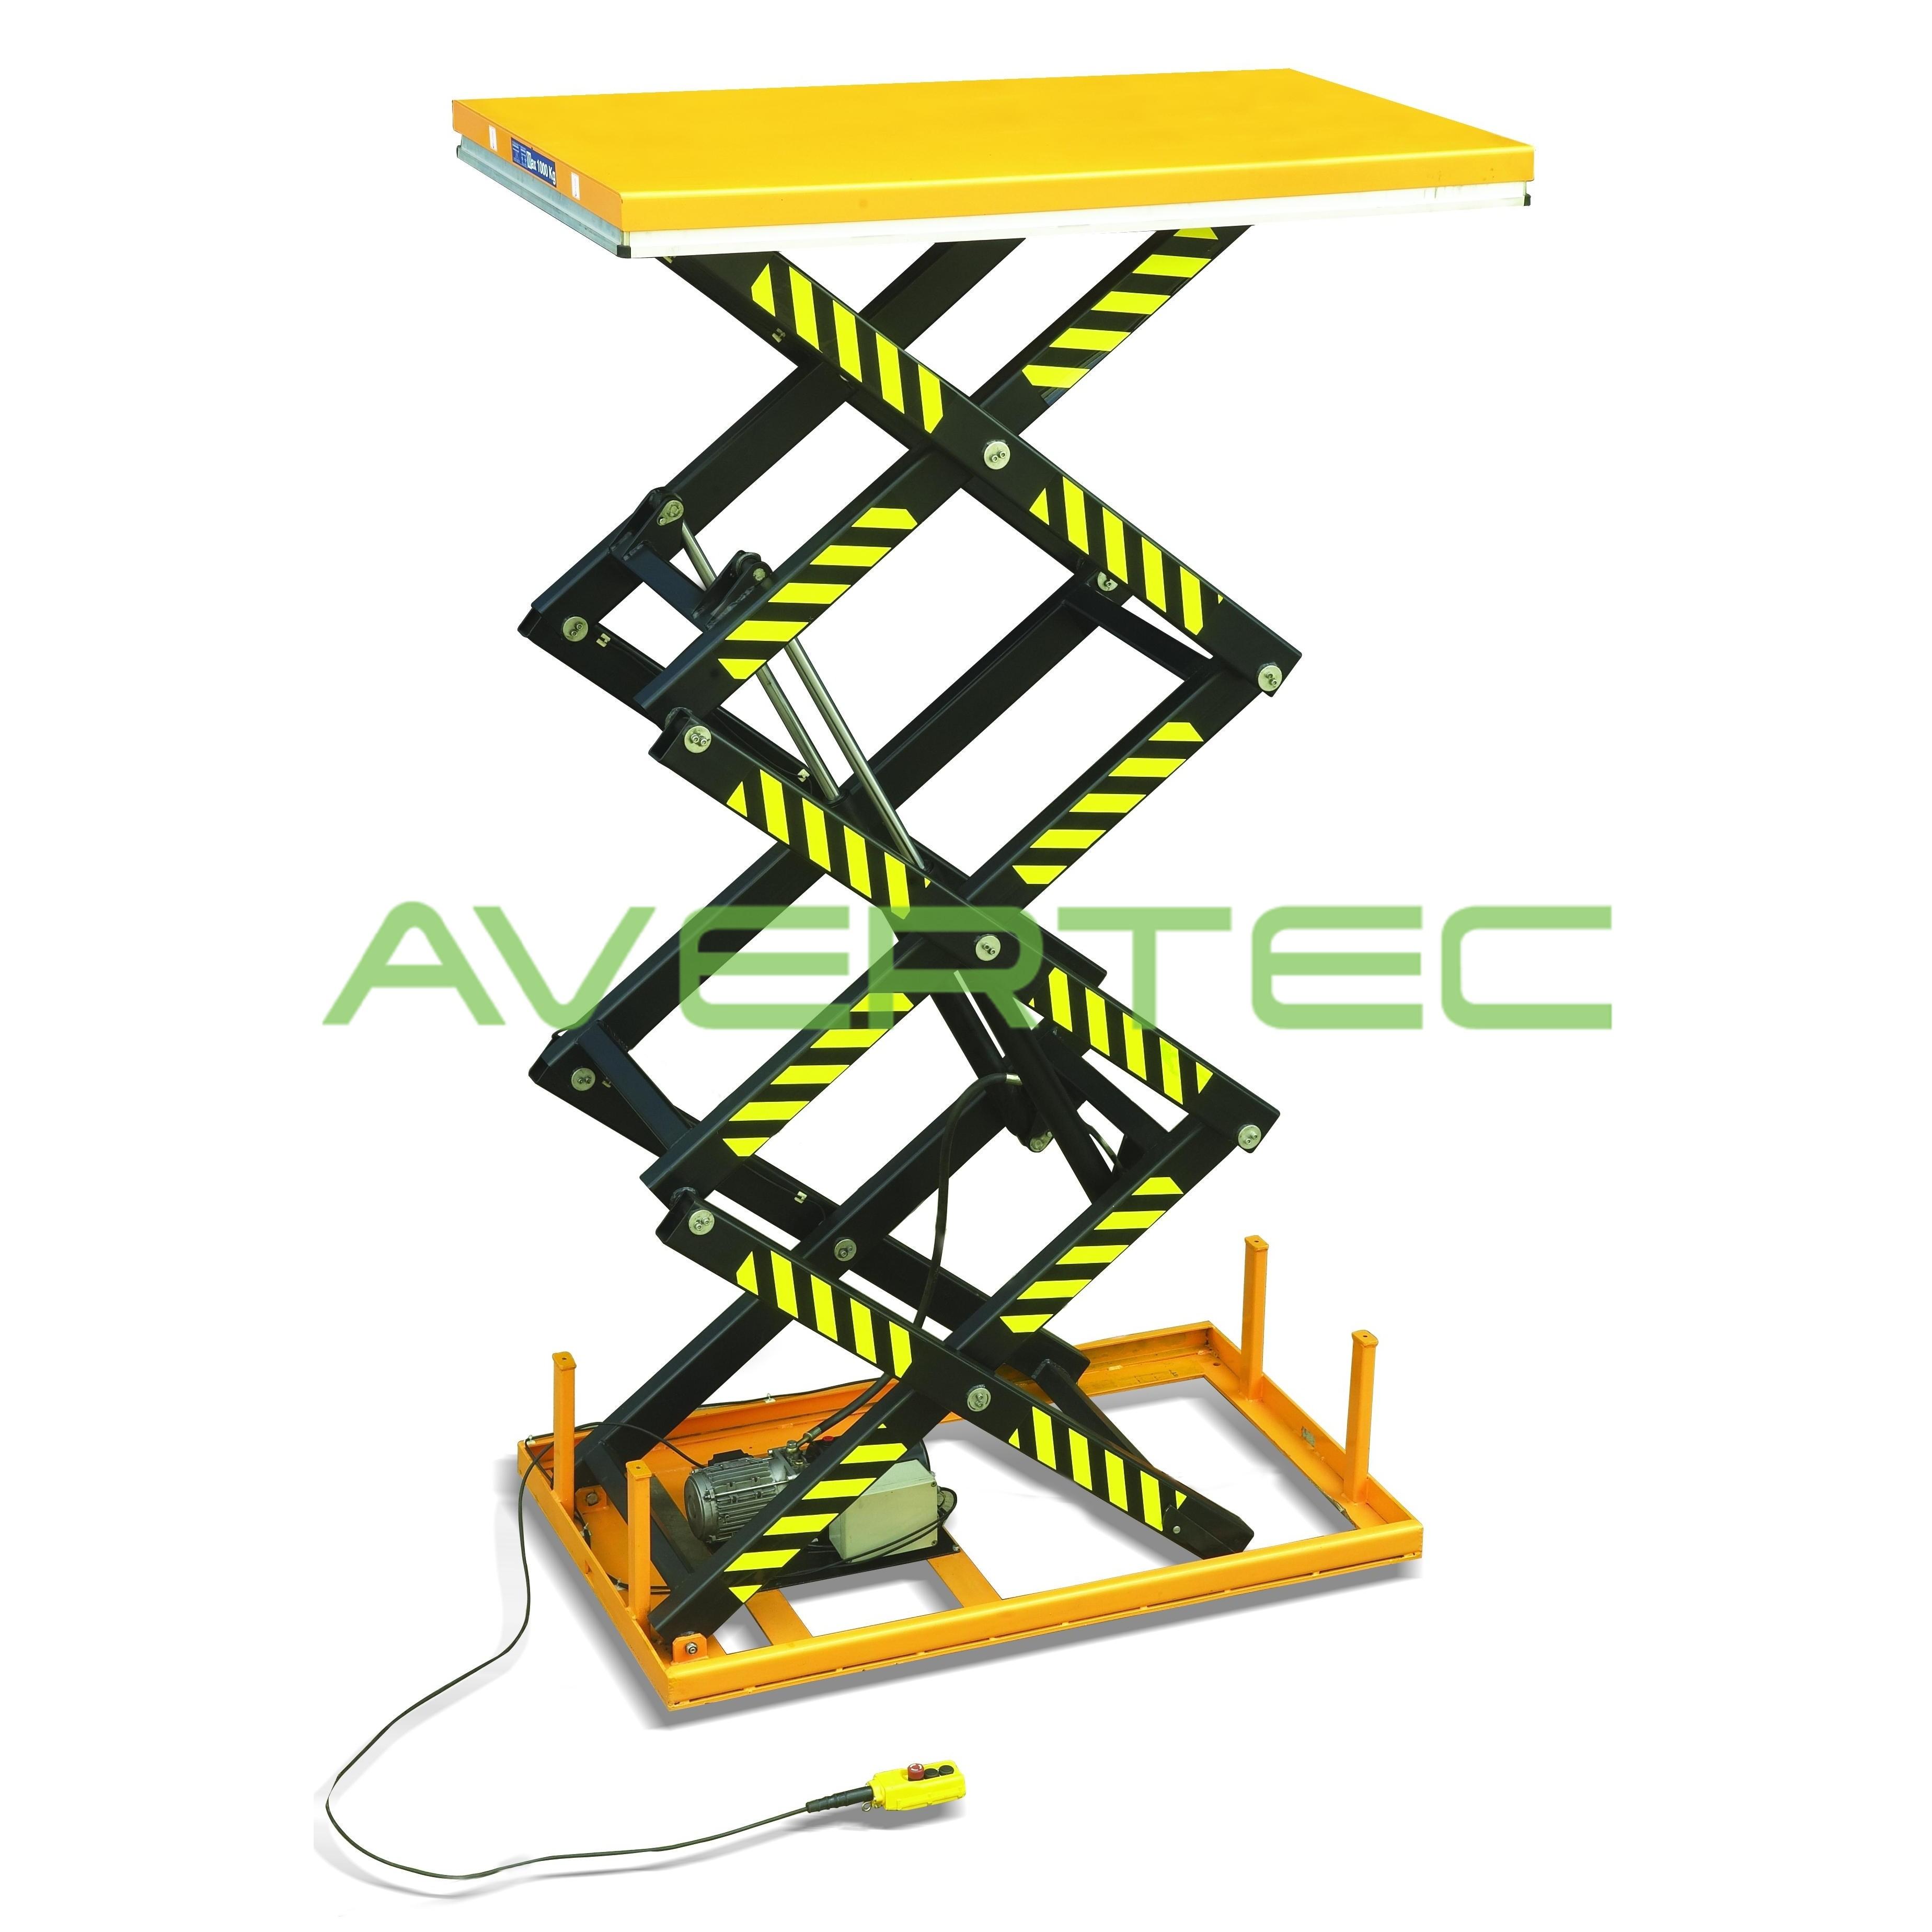 electric lift platform malaysia electric lift platform supplier. Black Bedroom Furniture Sets. Home Design Ideas